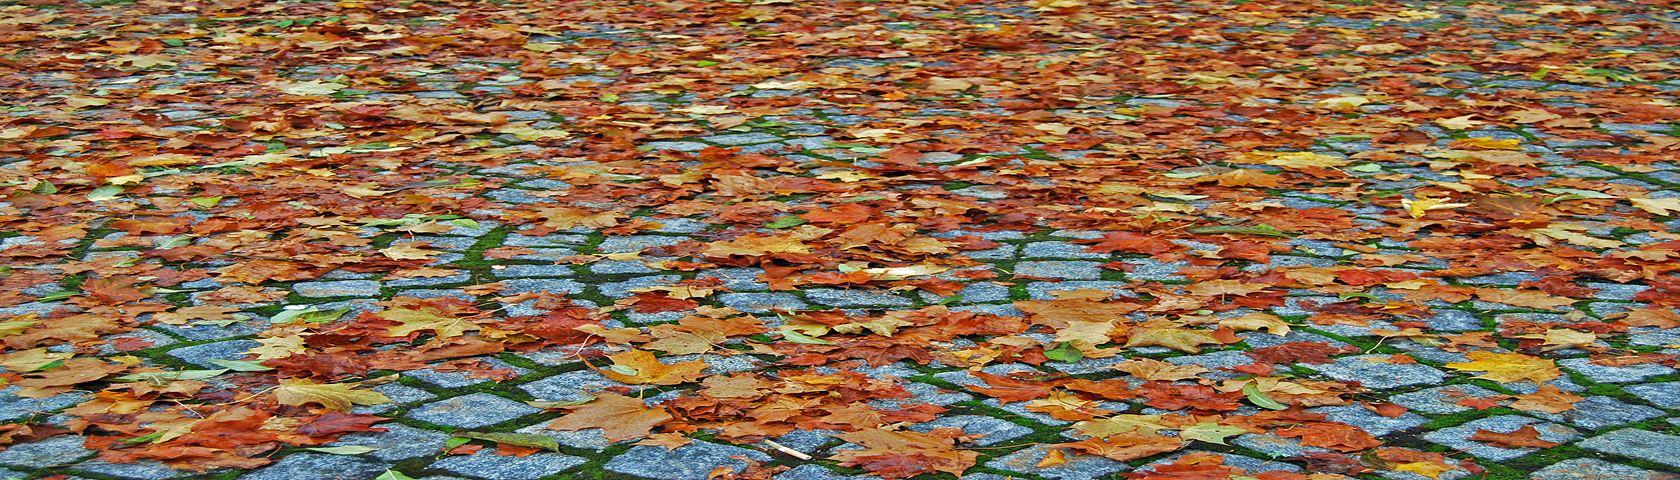 Cobblestones and Leaf